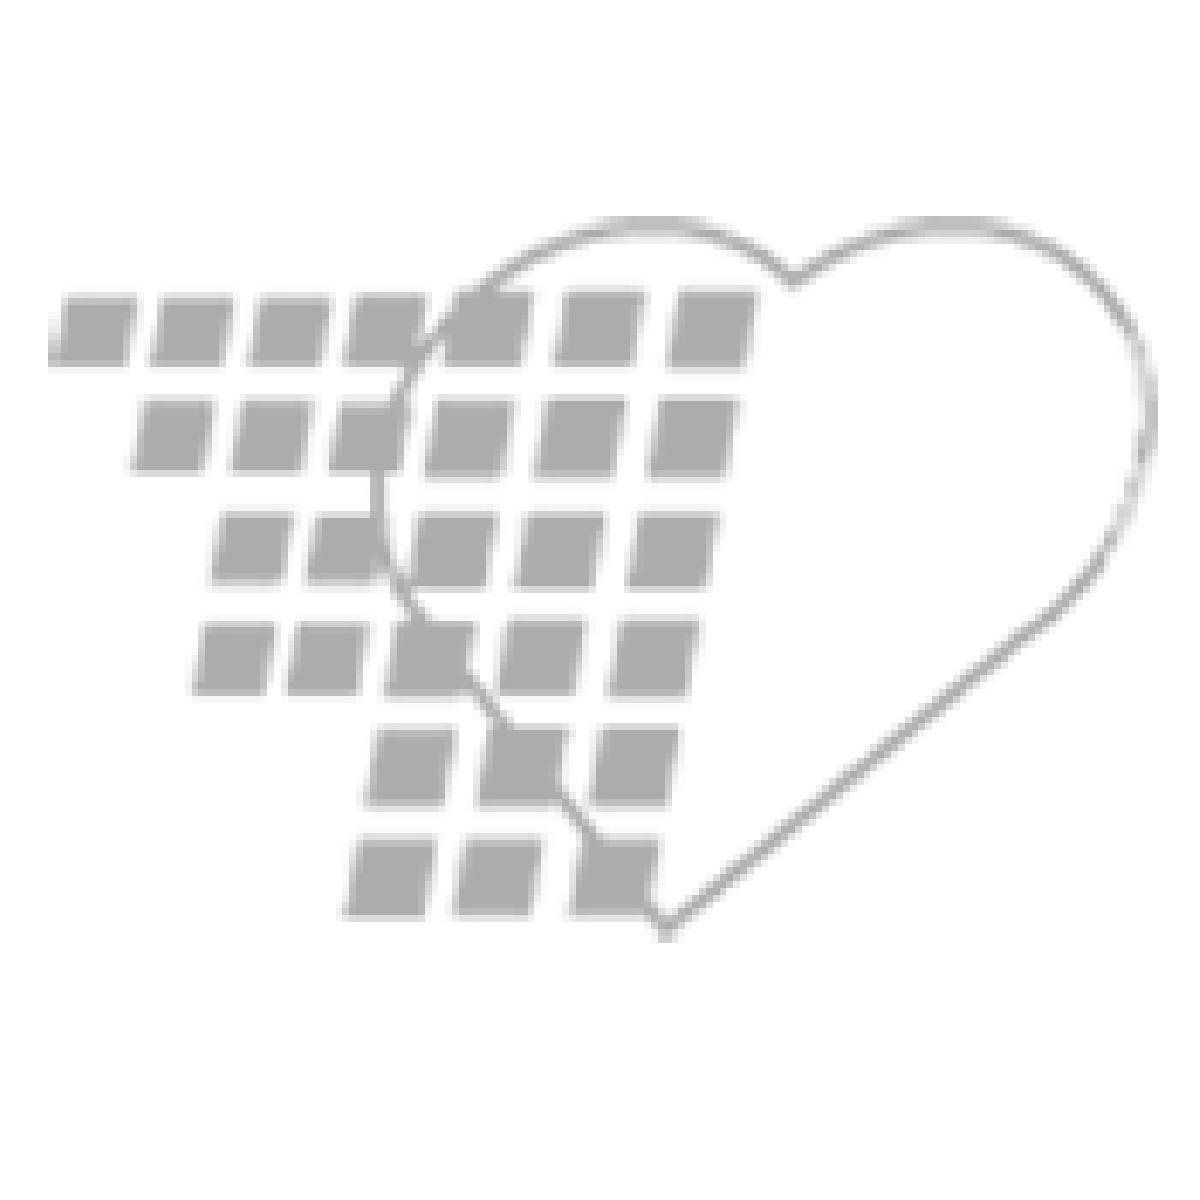 06-93-1504 - Demo Dose® Simulated Levalbuterol HCL 1.25mg/3 mL